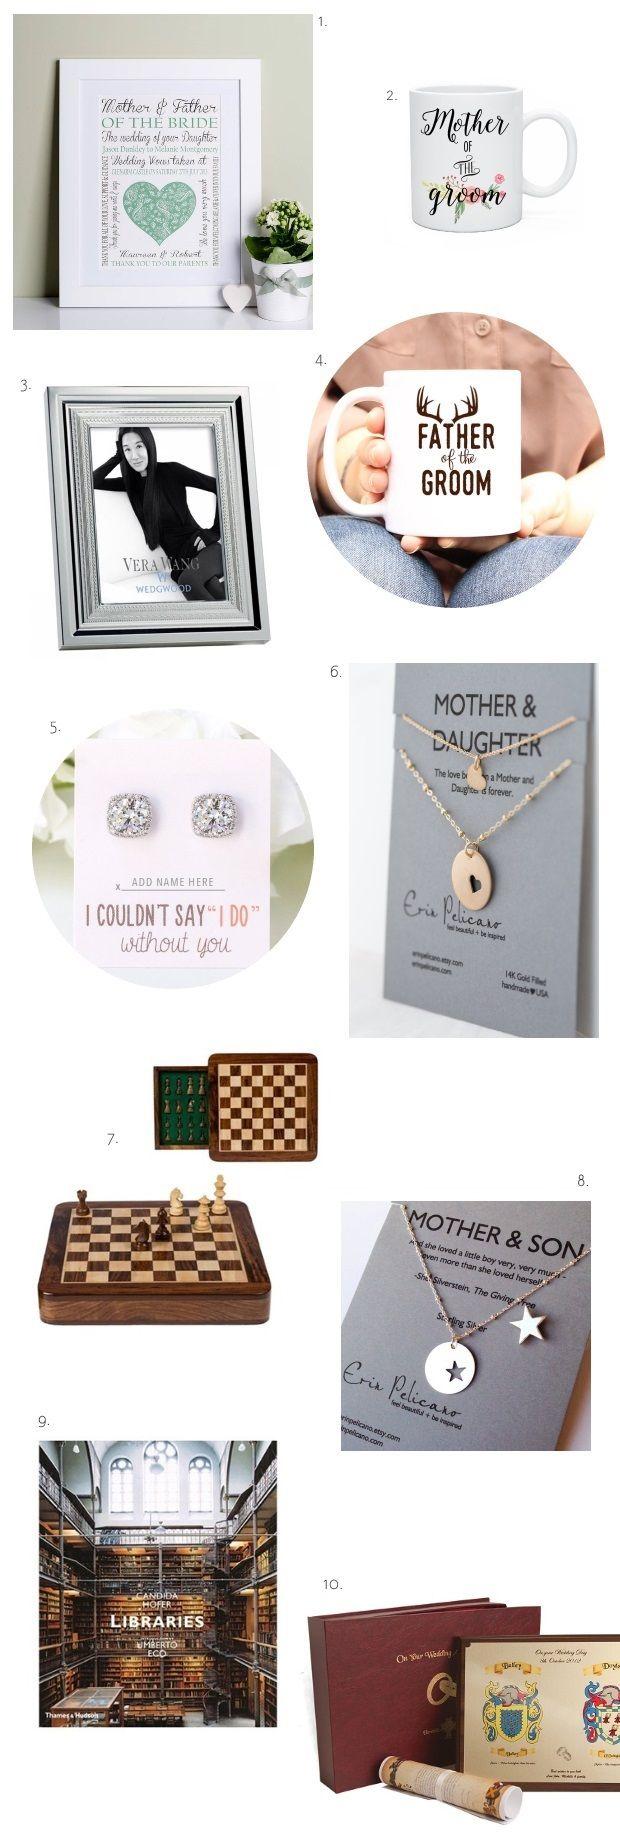 Best 25+ Best wedding gifts ideas on Pinterest | Engagement mugs ...